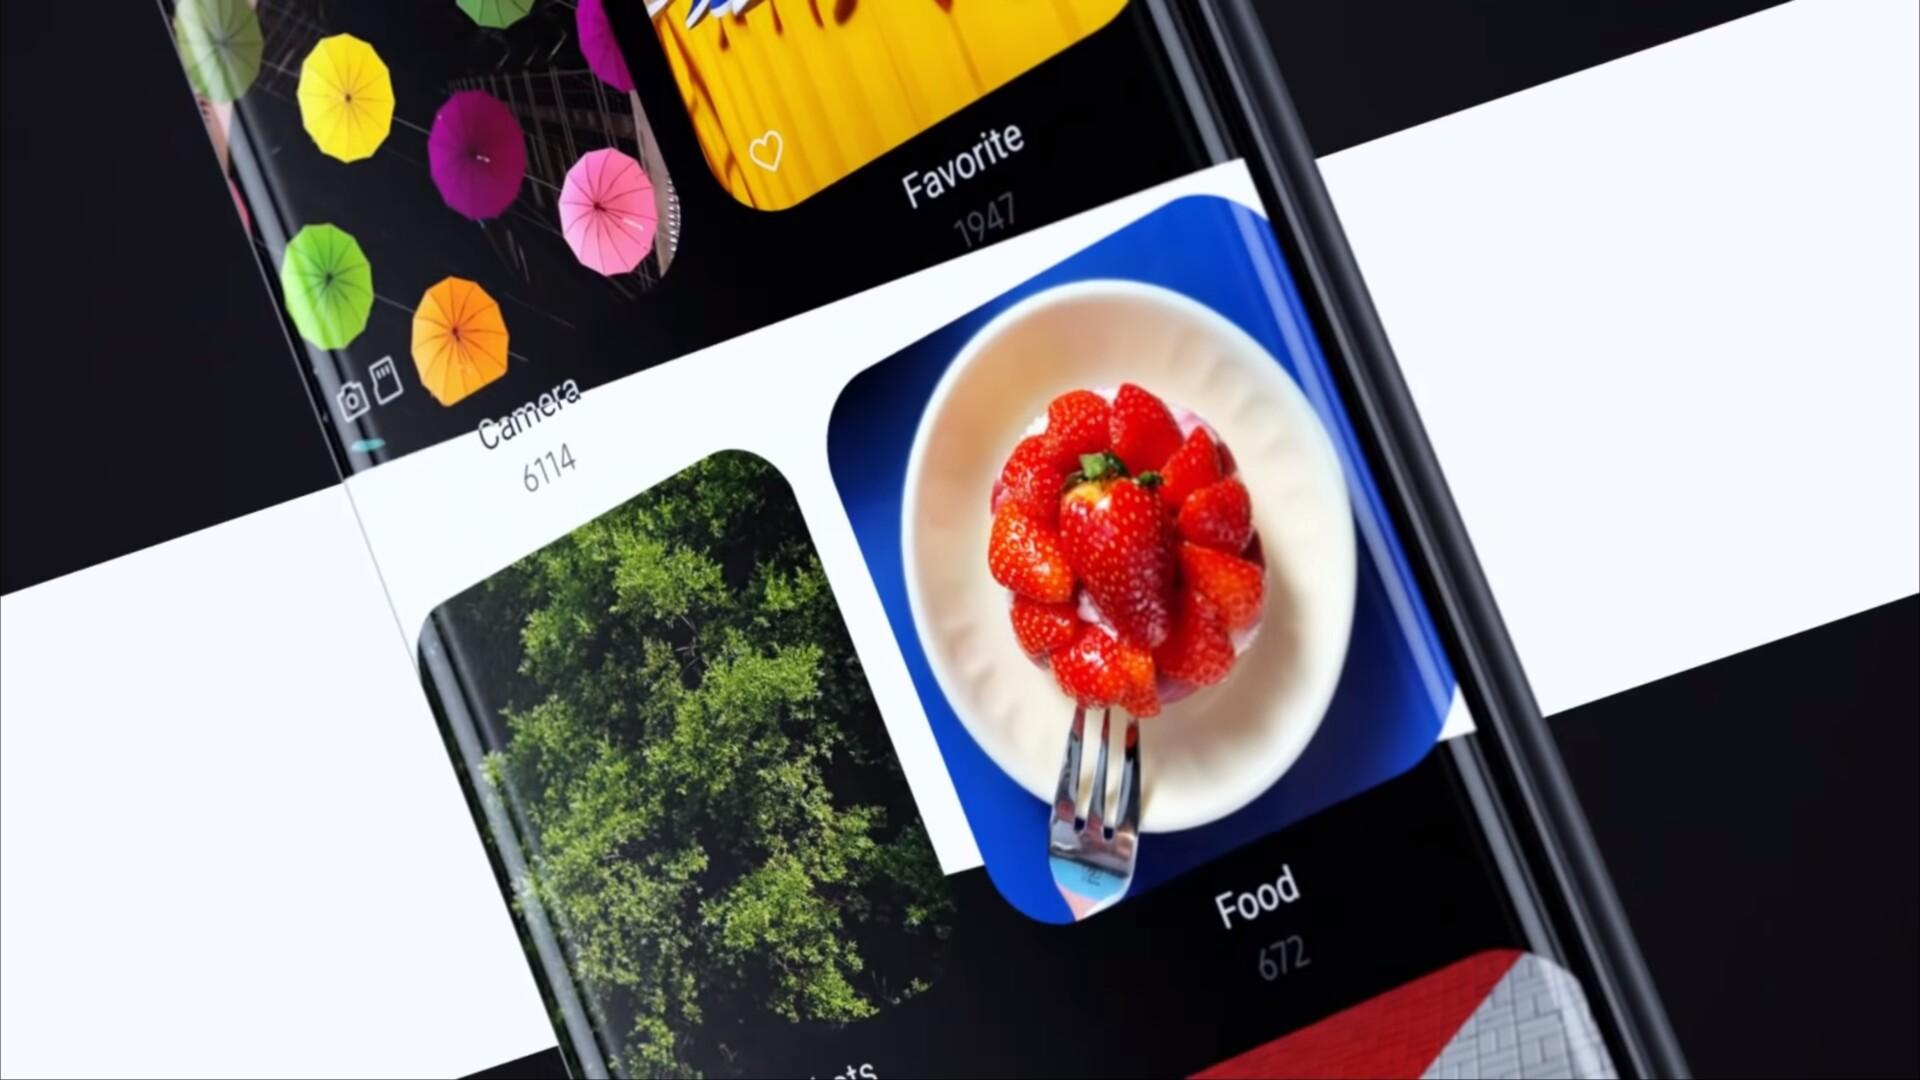 Ux 1 - Magazine cover